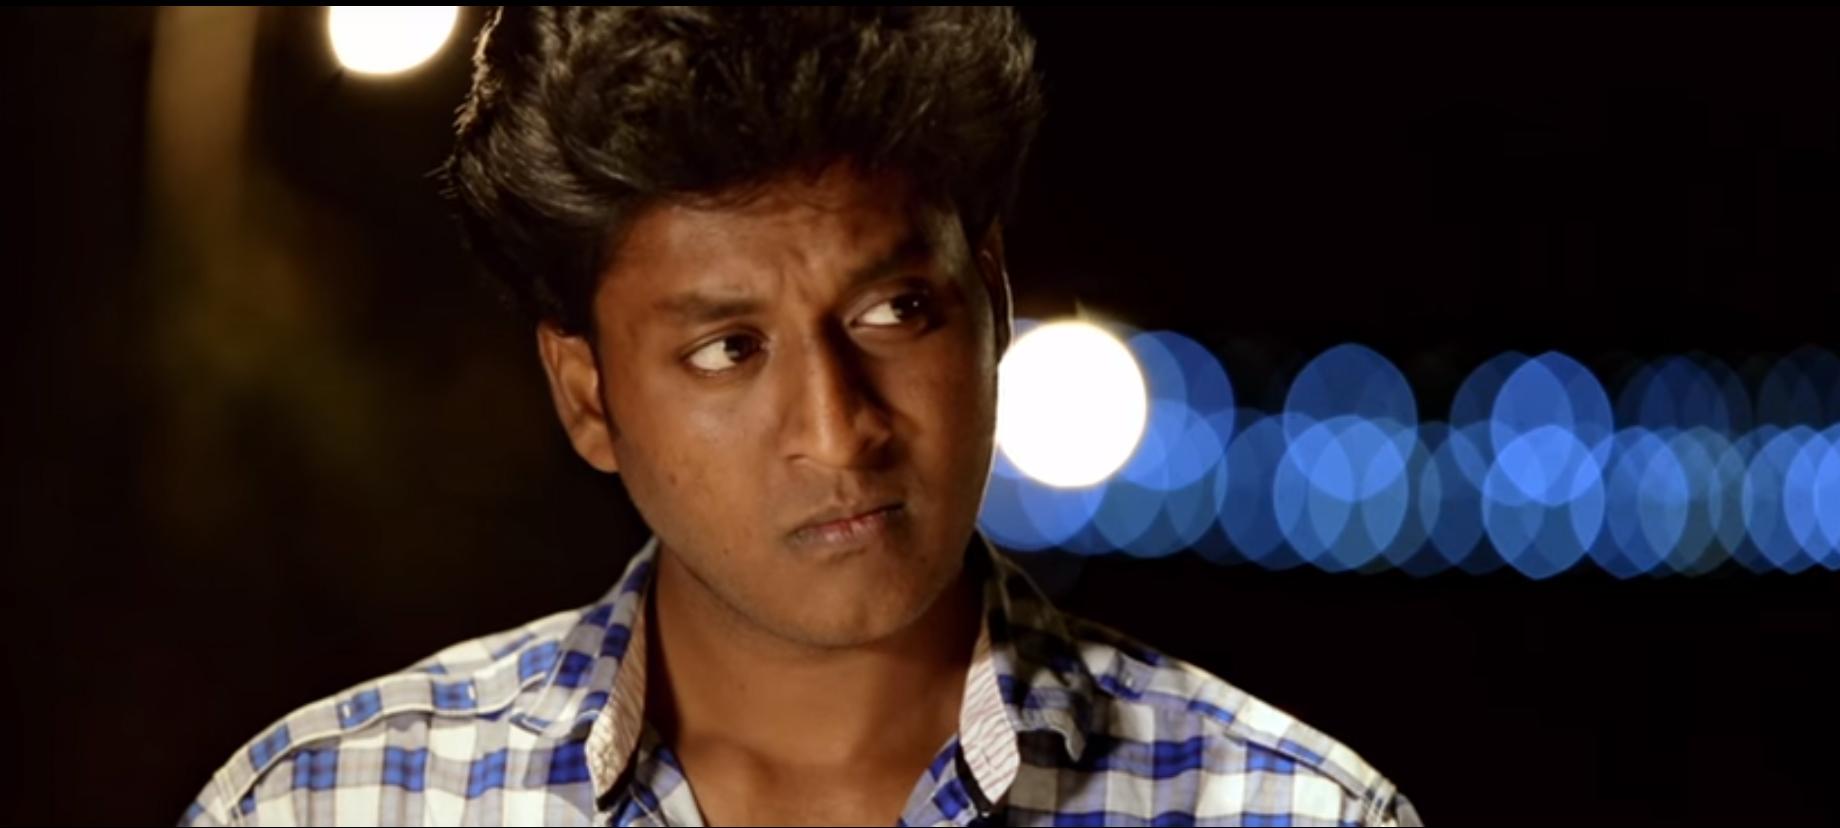 Kai Kadikaaram (wrist watch) Tamil Short Film